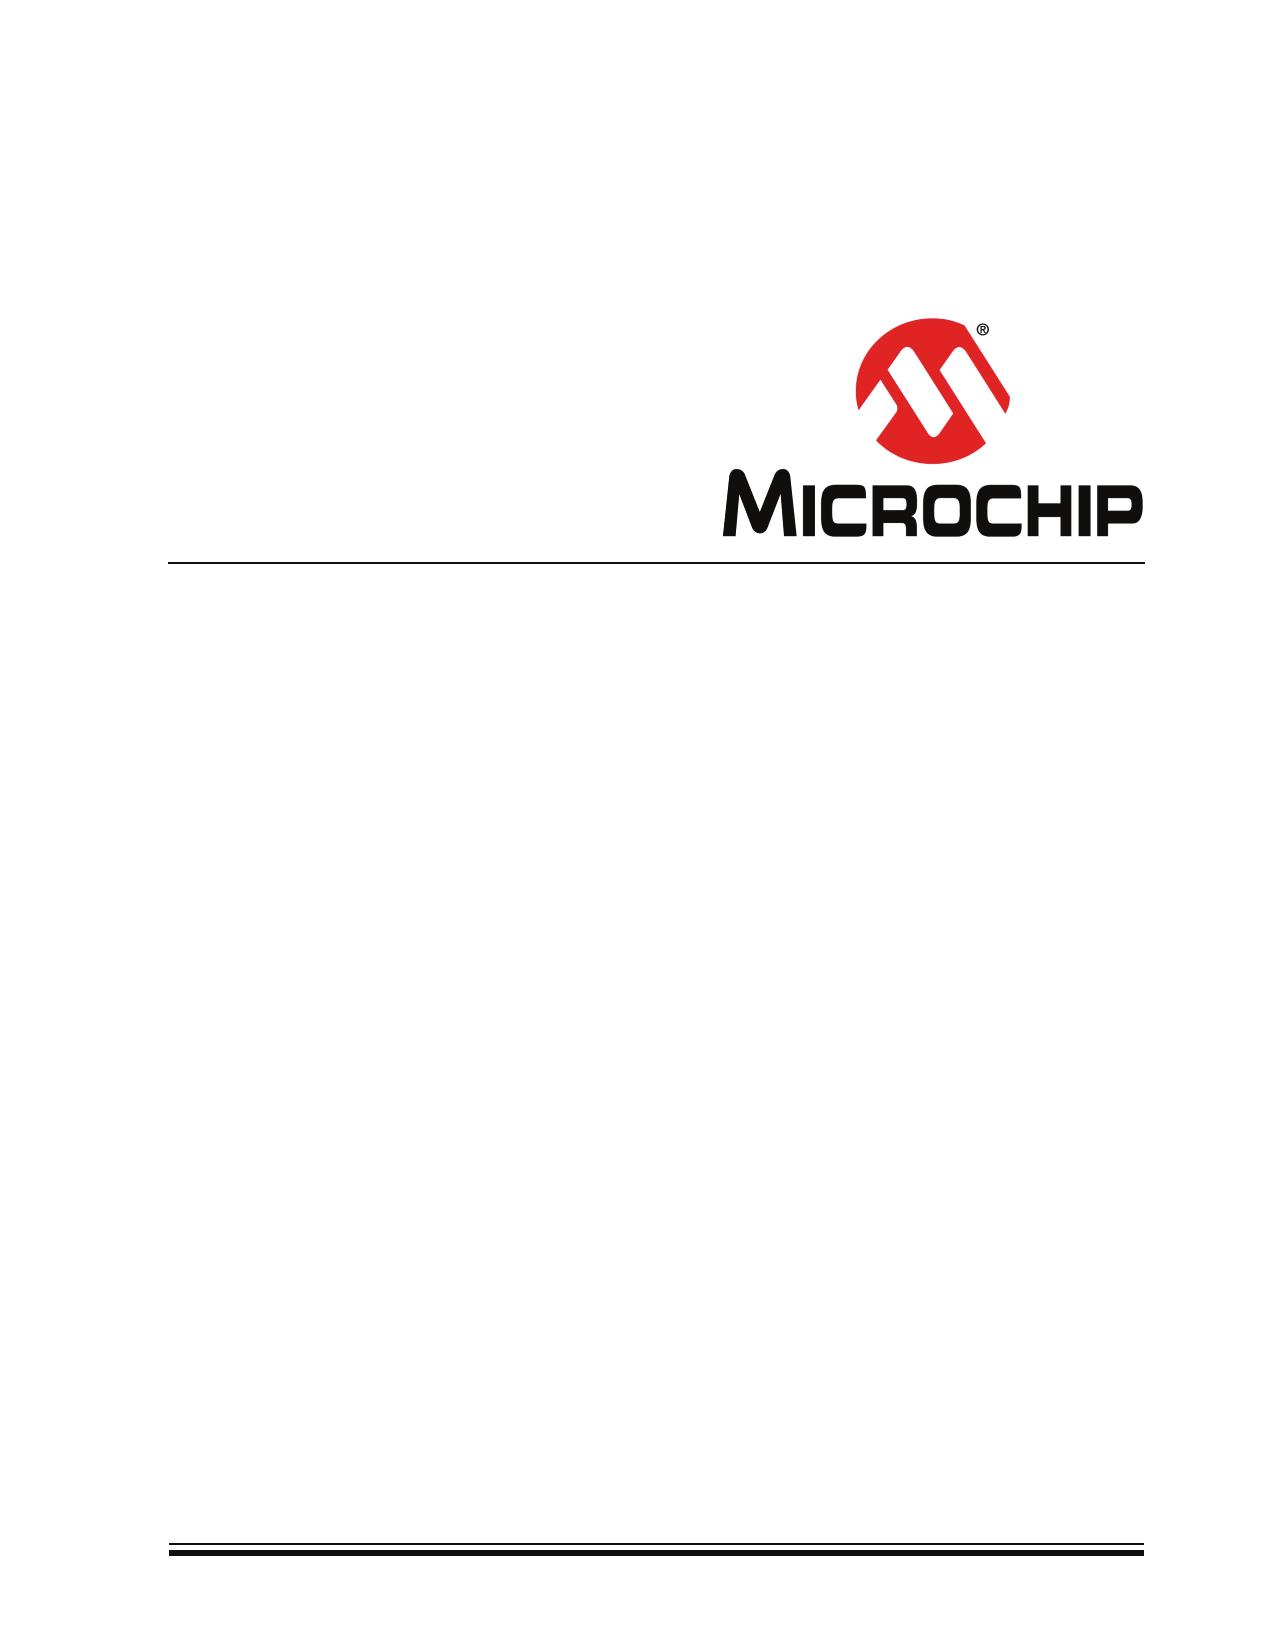 PIC12HV752 데이터시트 및 PIC12HV752 PDF